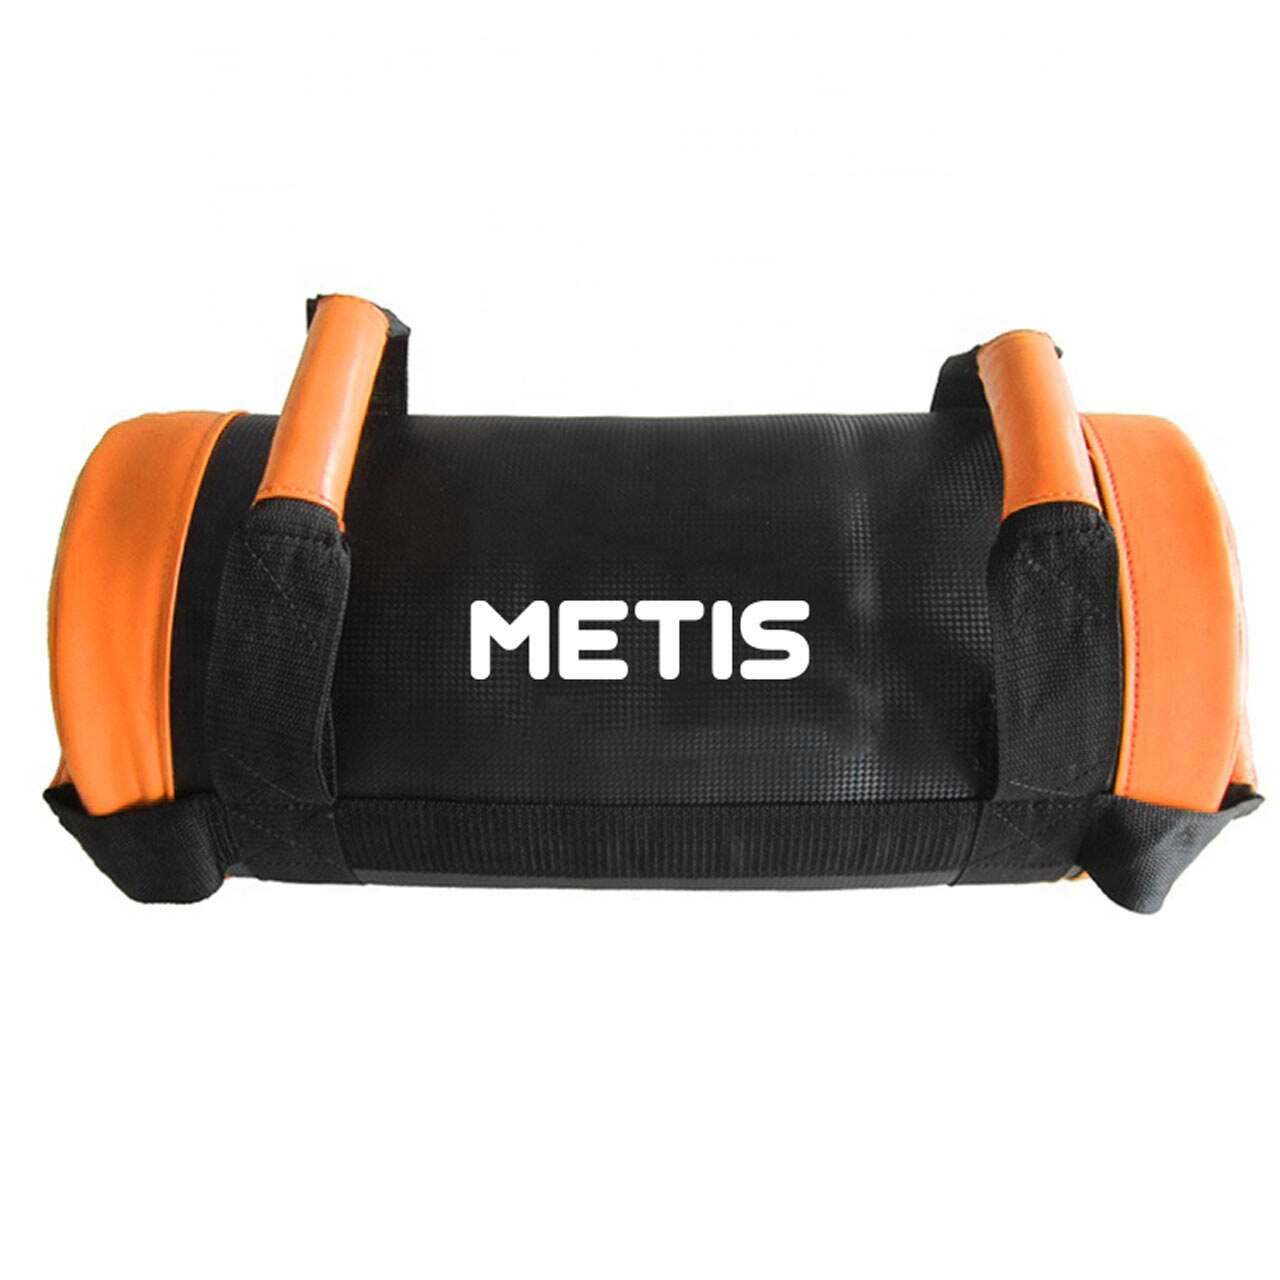 Metis Power Bags [5-25kg]